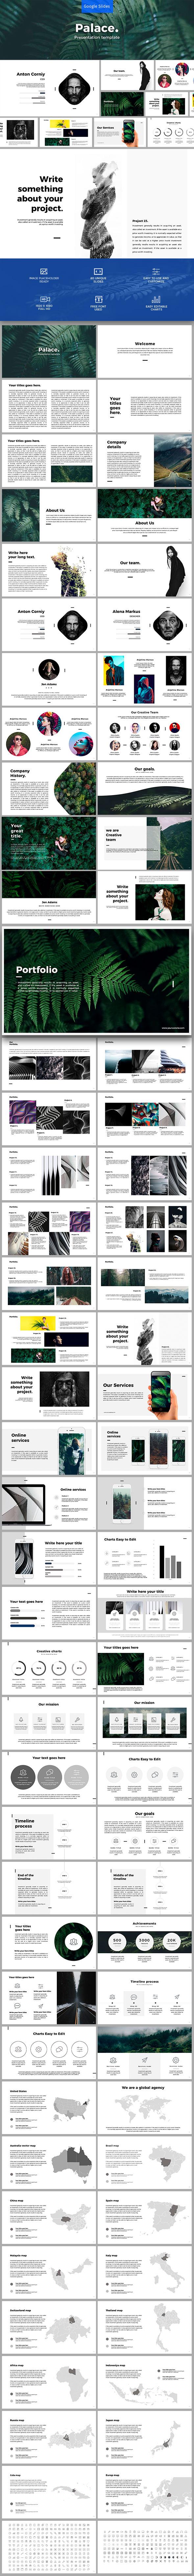 Palace Google Slides - Google Slides Presentation Templates